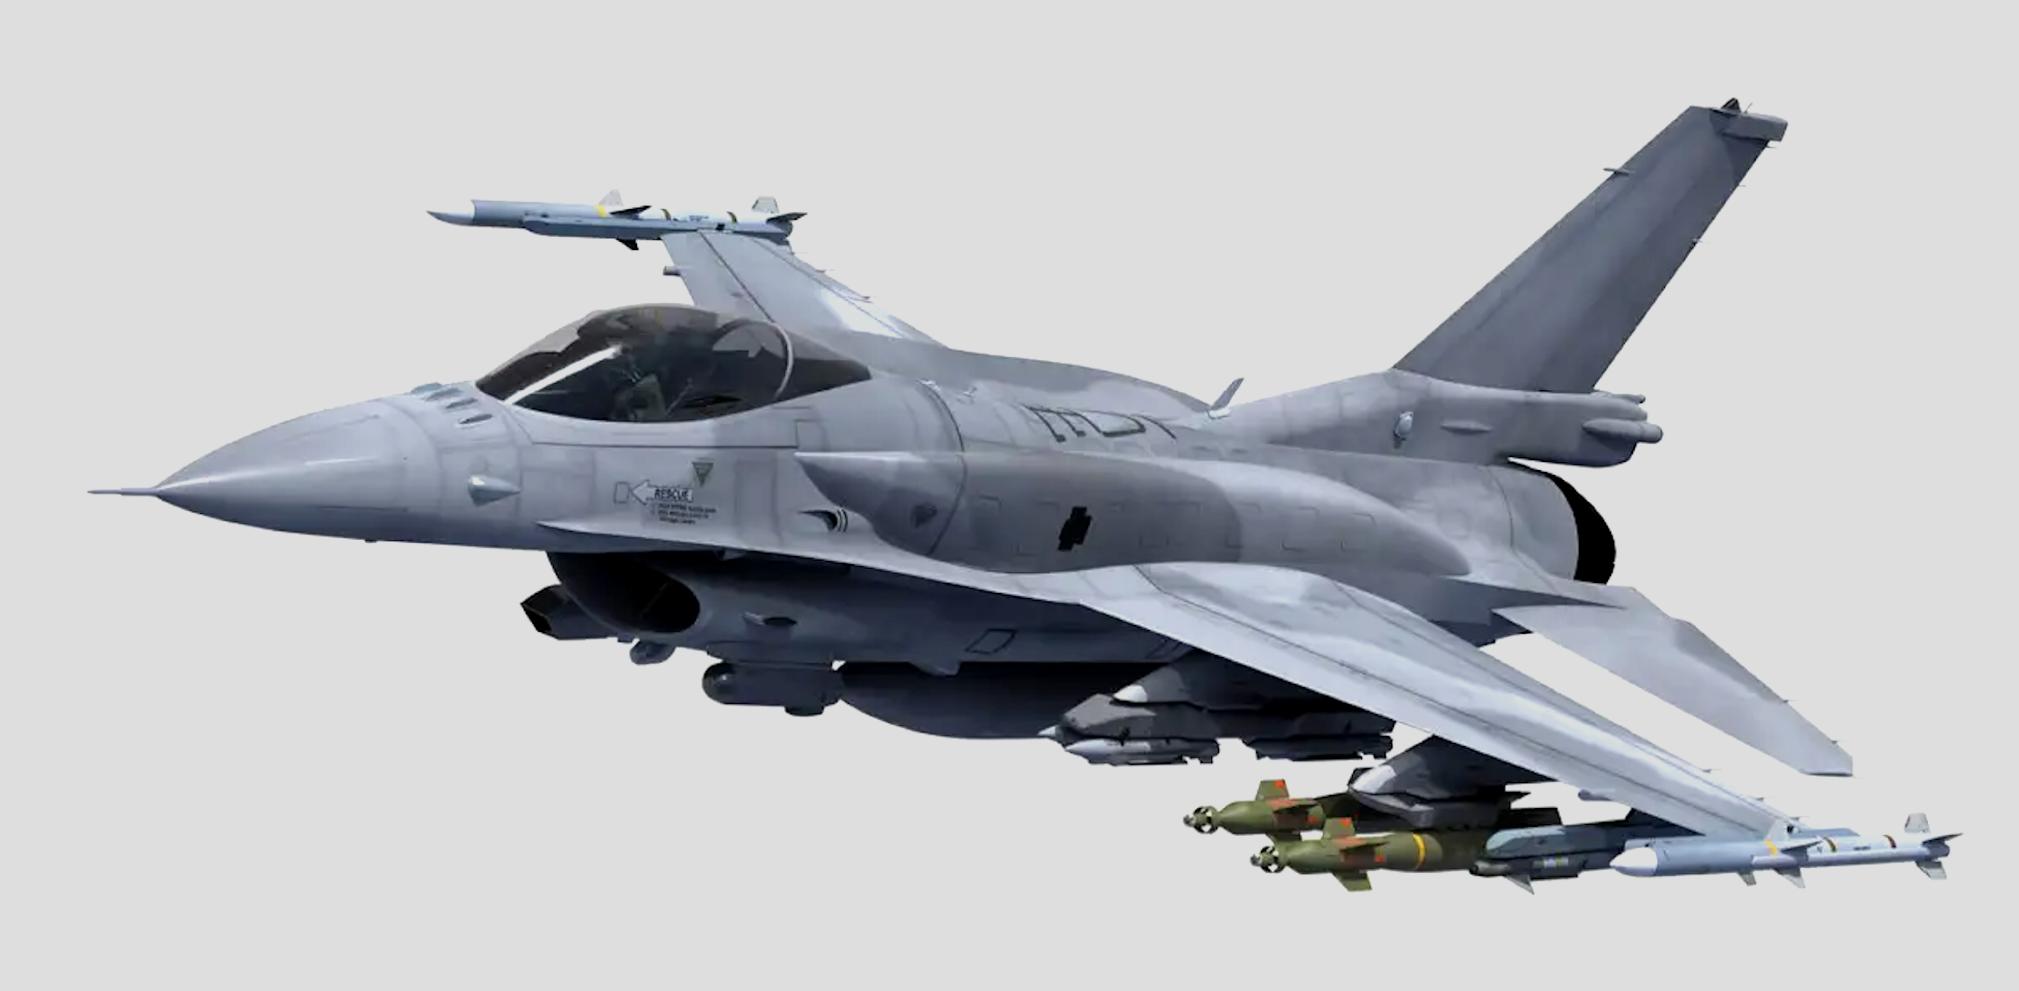 F-16 Block 70/72 [Lockheed Martin]